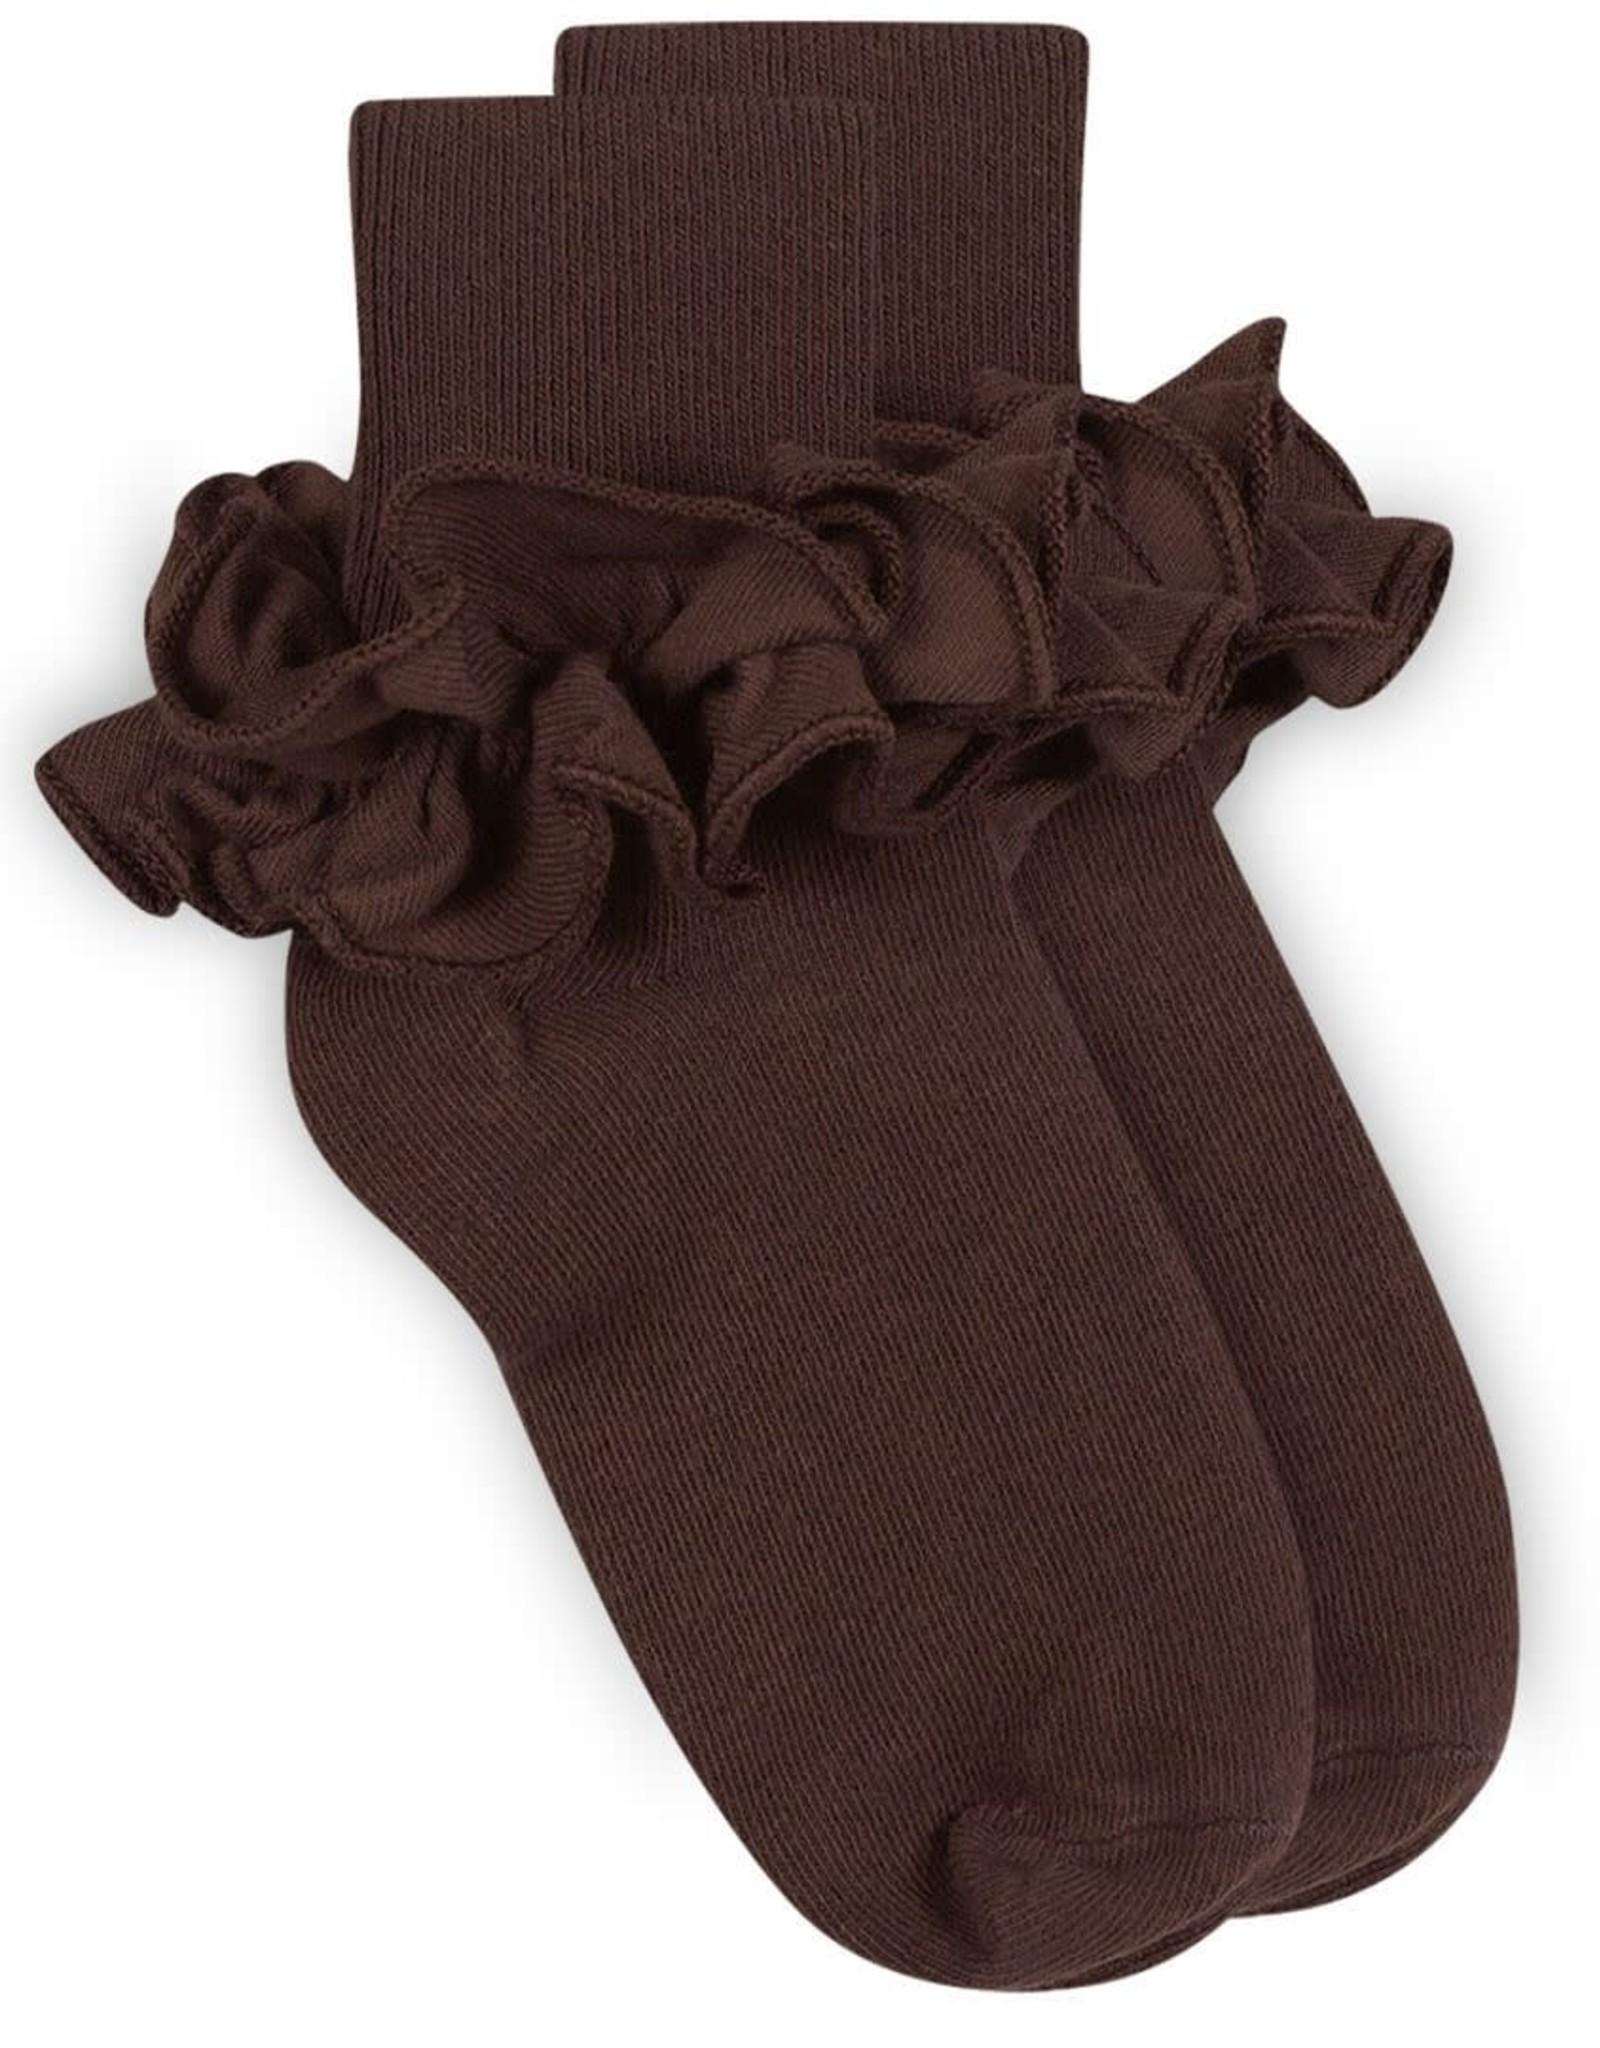 Jefferies Socks Brown Ruffle Socks